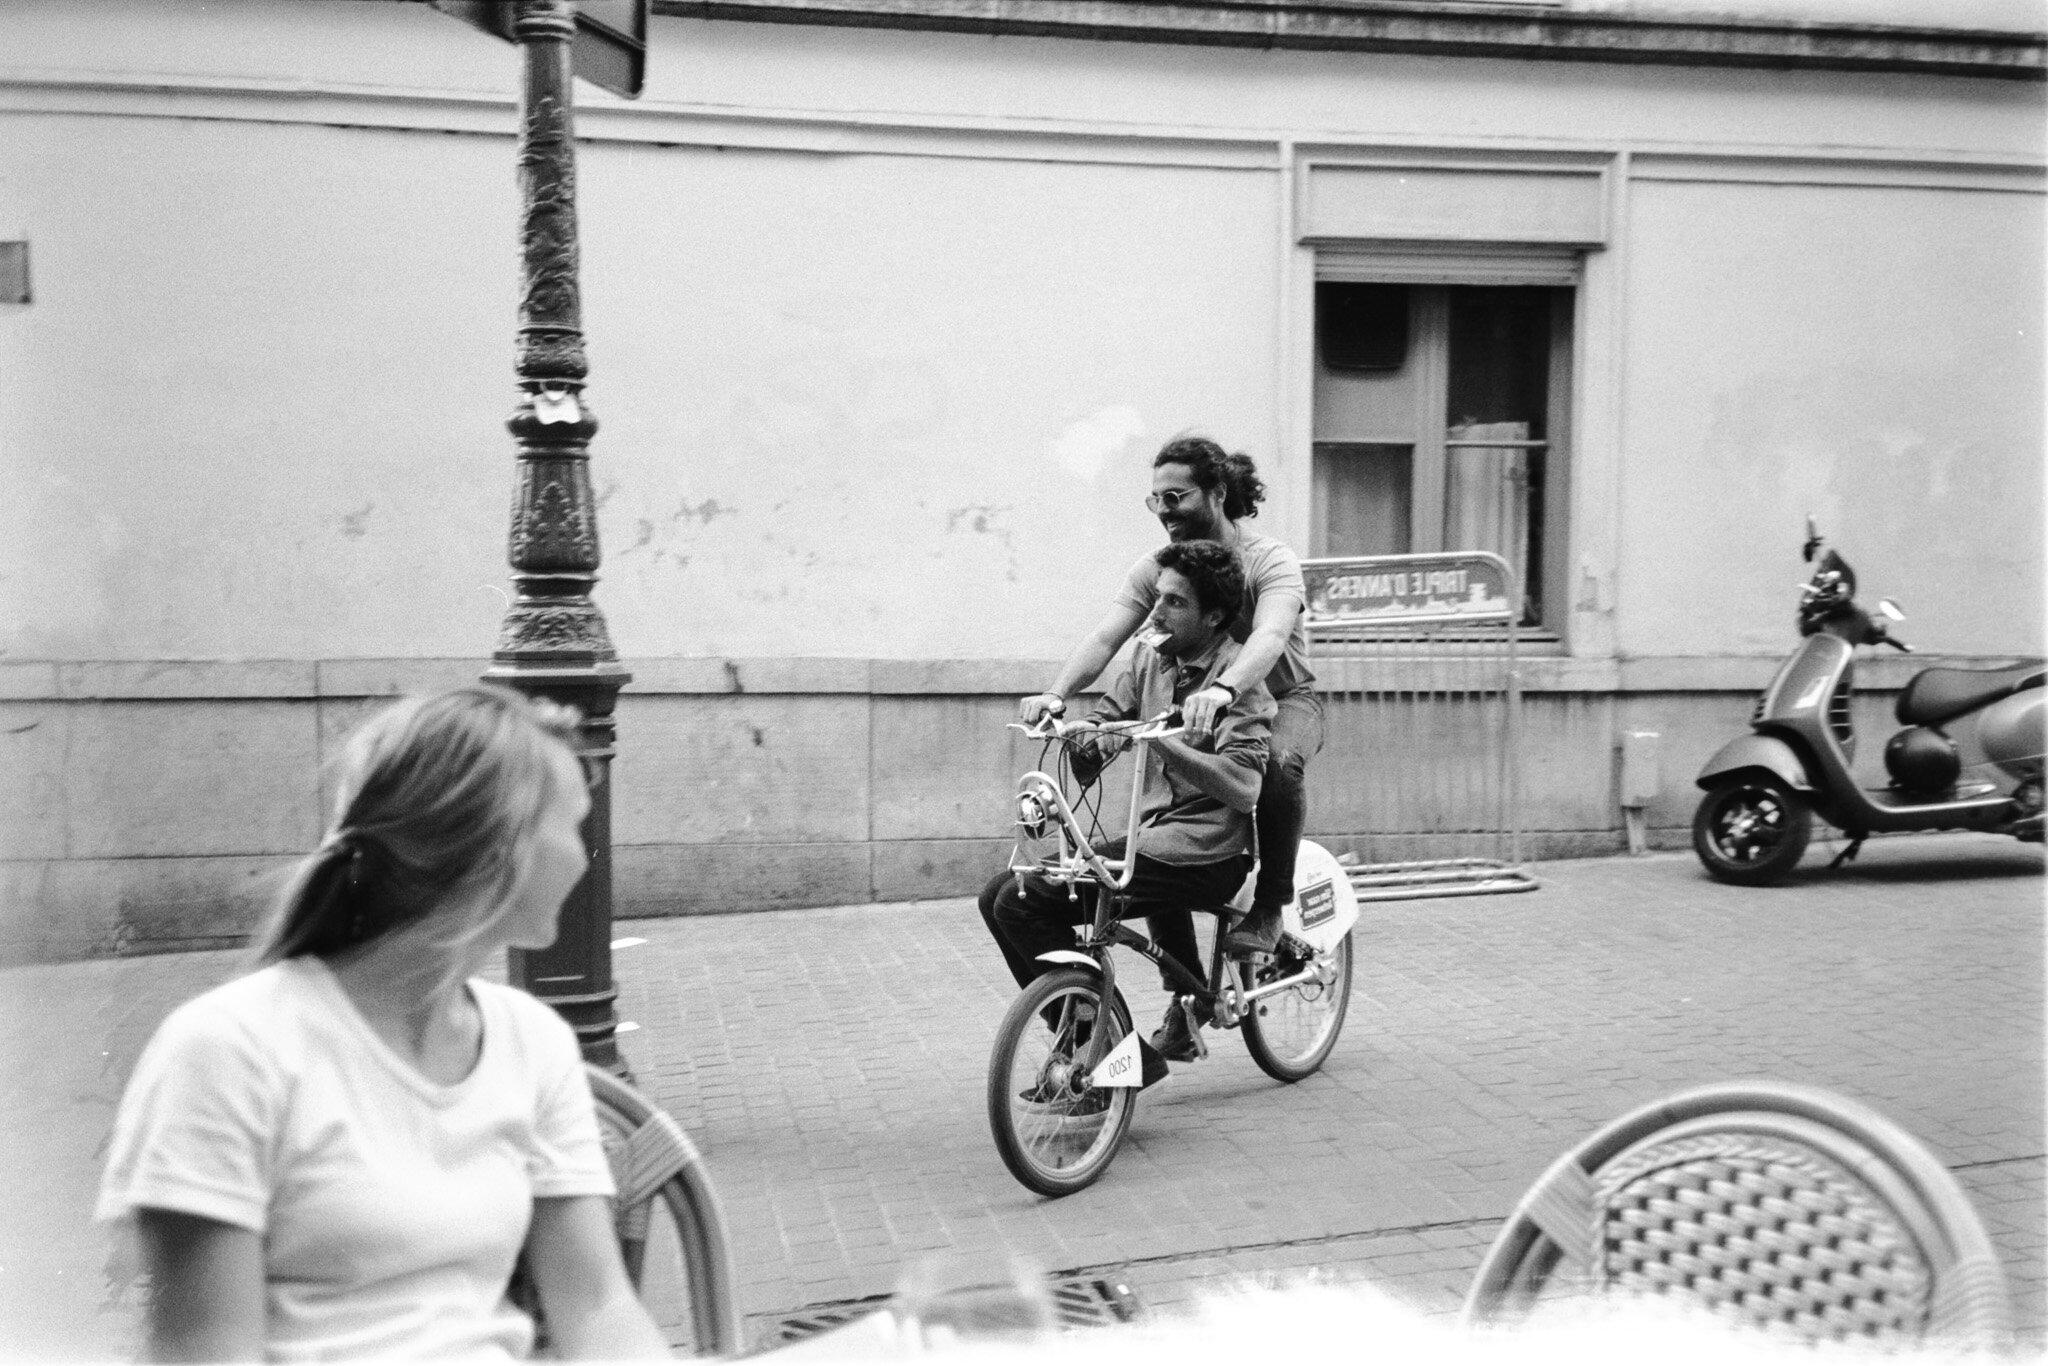 Alberto and Boudi in Antwerp